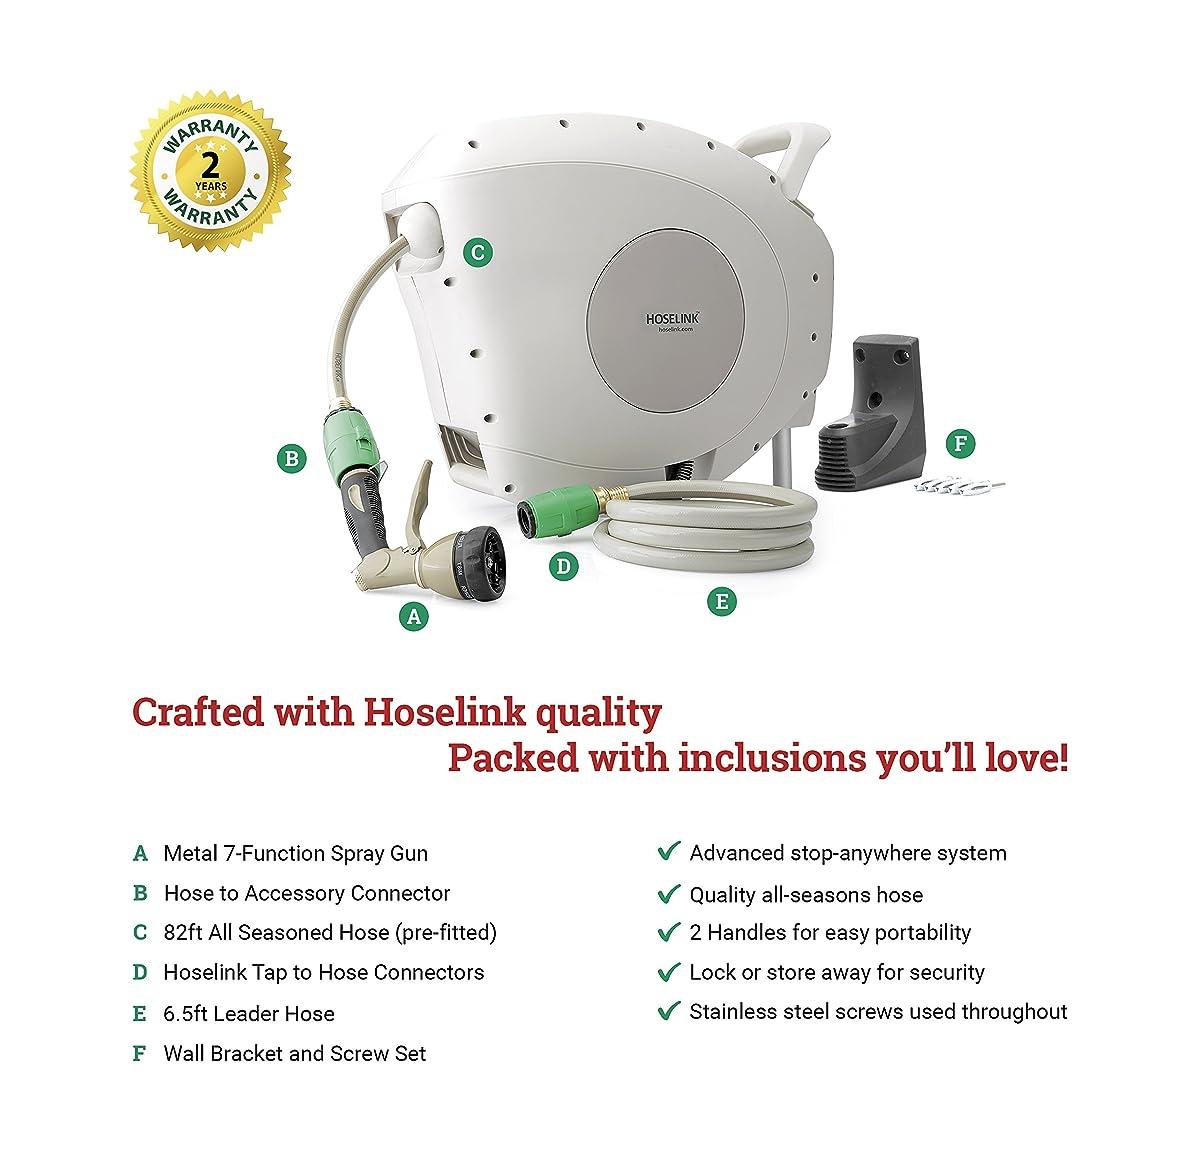 Hoselink Retractable Hose Reel 82 feet with Metal 7-Function Spray Gun